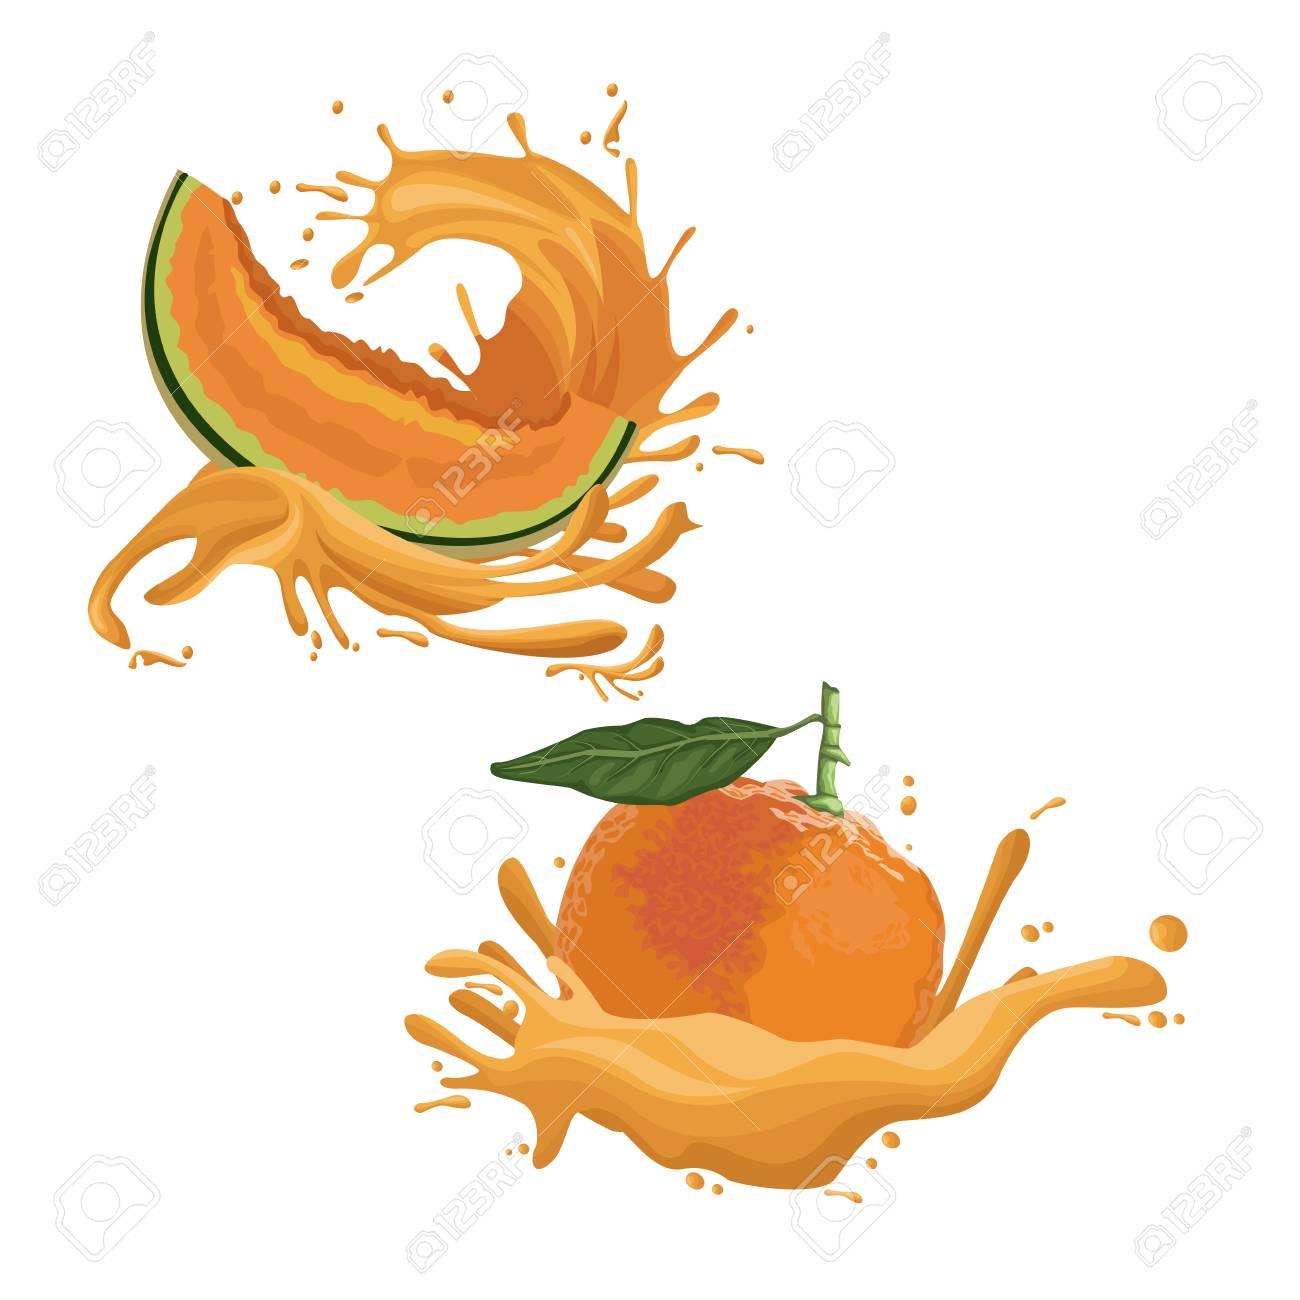 melon and orange fruit splash icon vector illustration graphic rh 123rf com